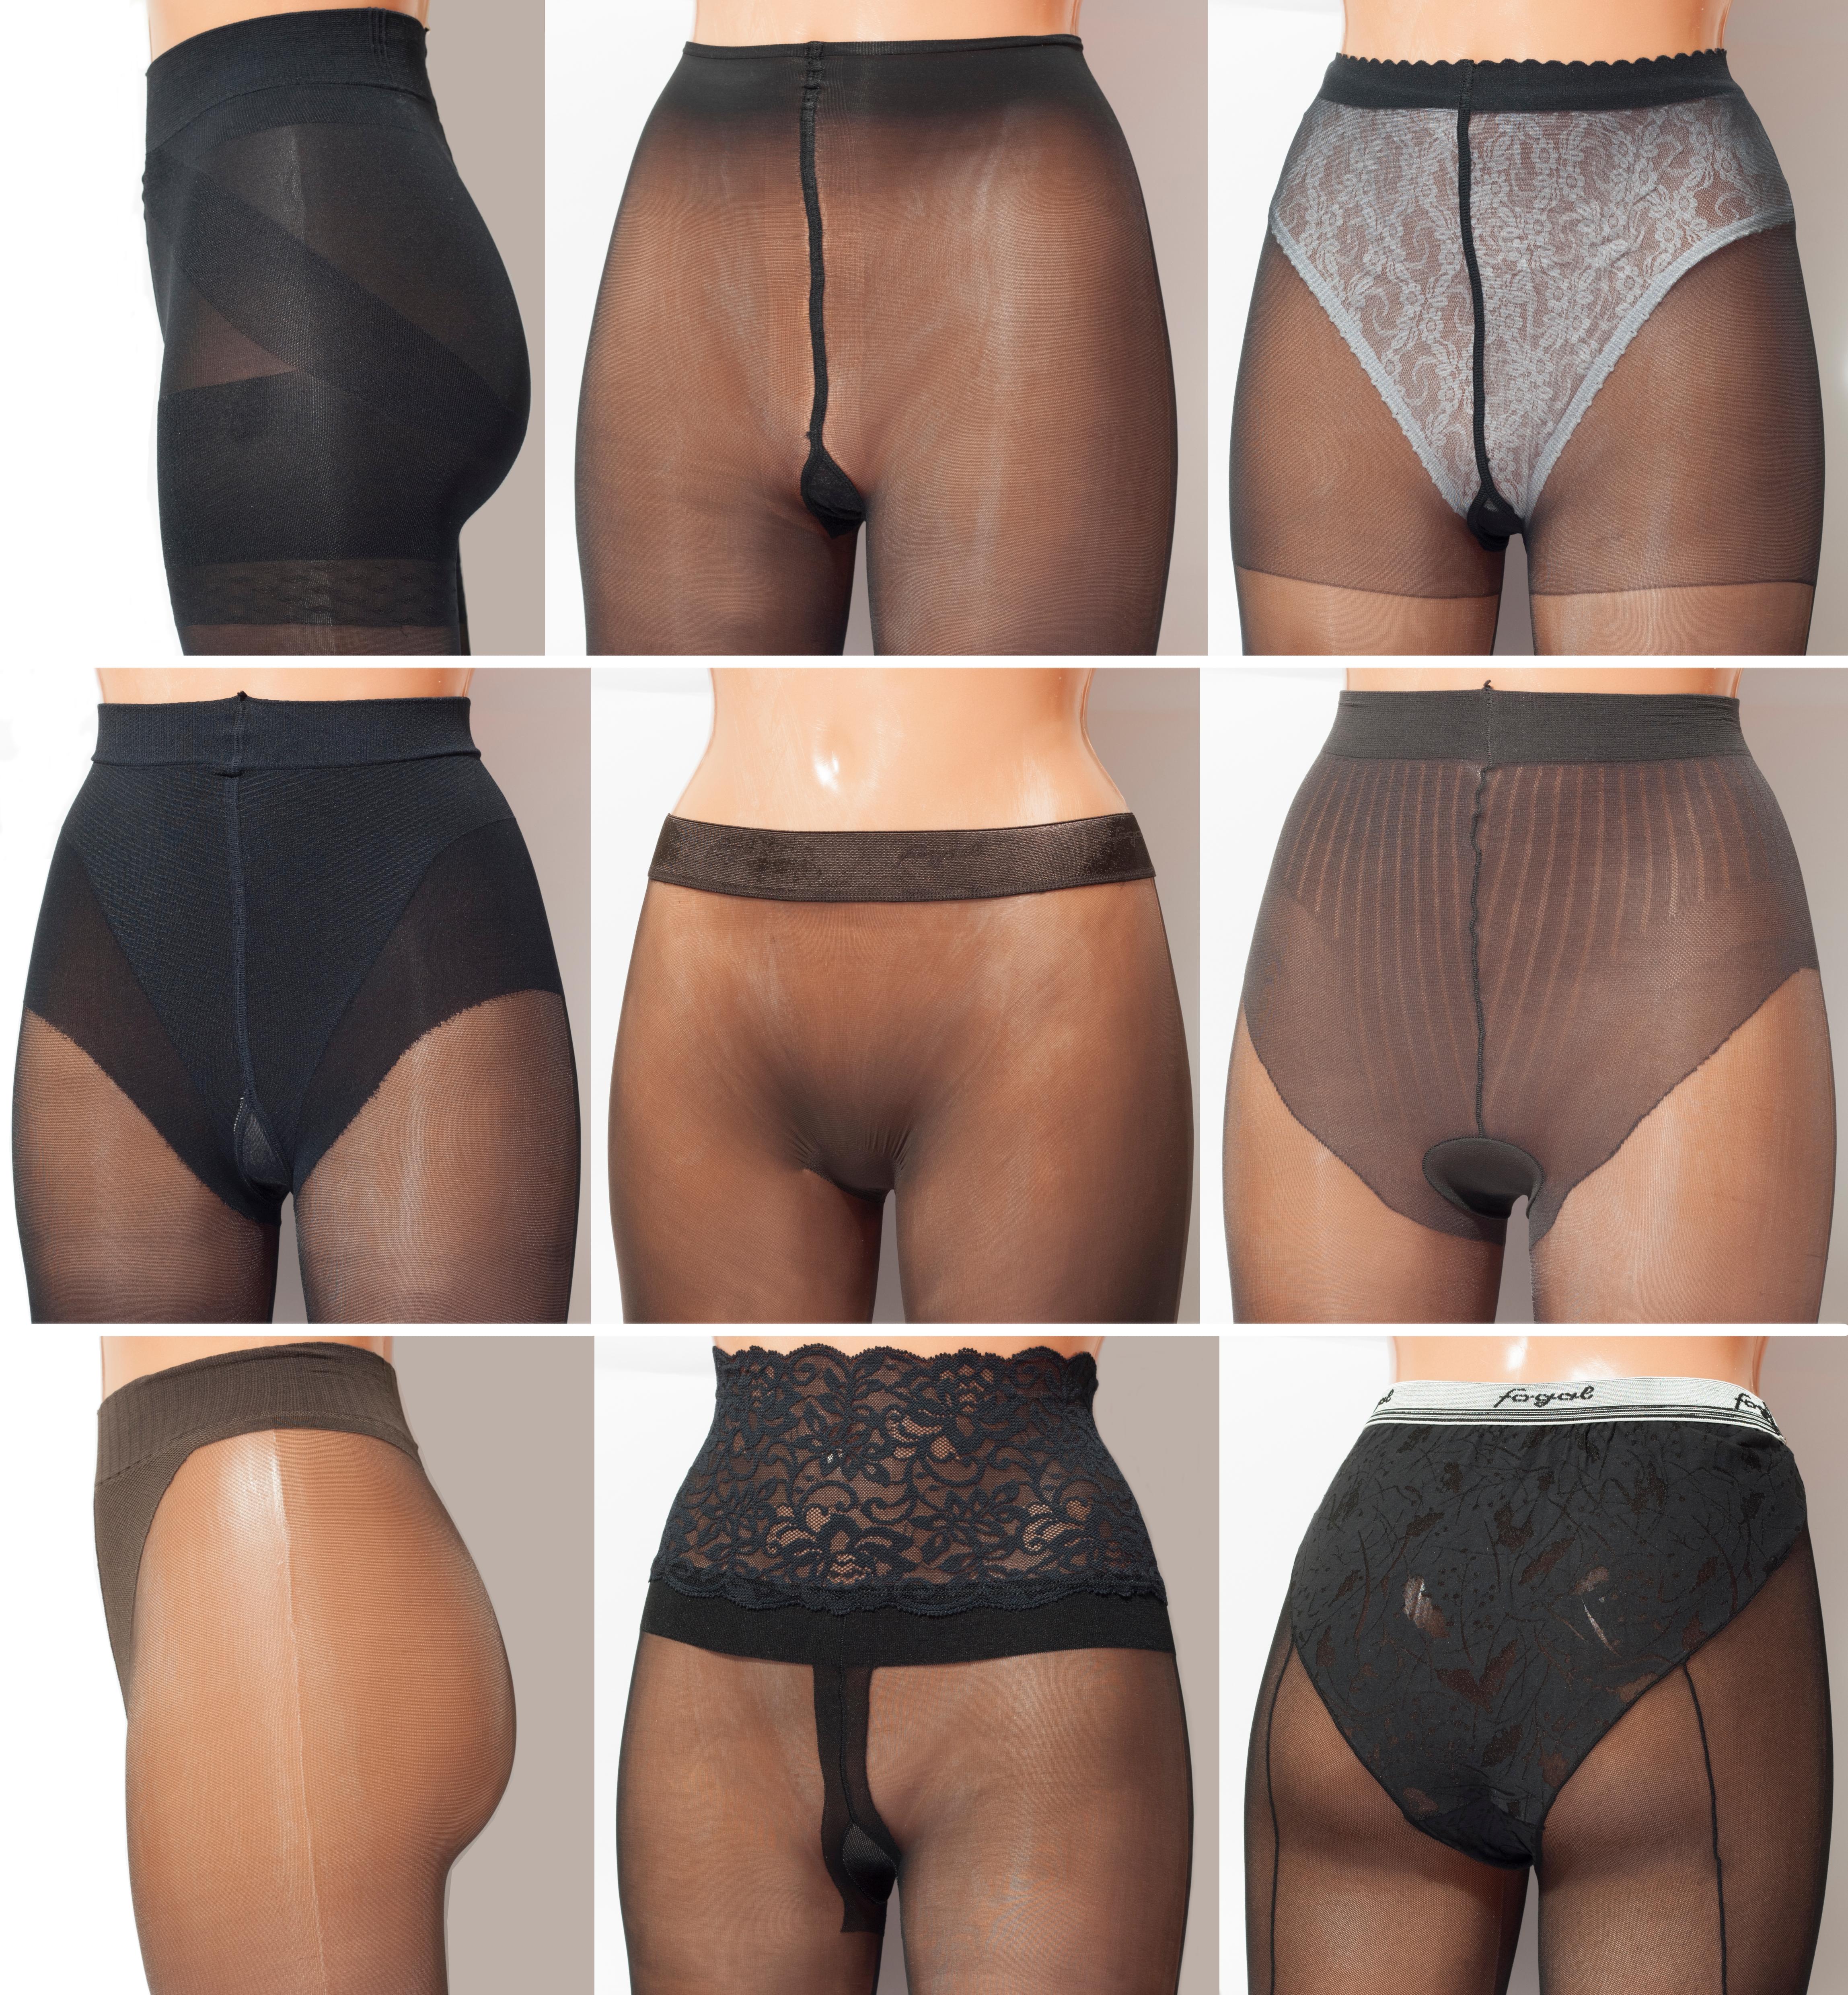 Pantyhose panties under Pantyhose panties